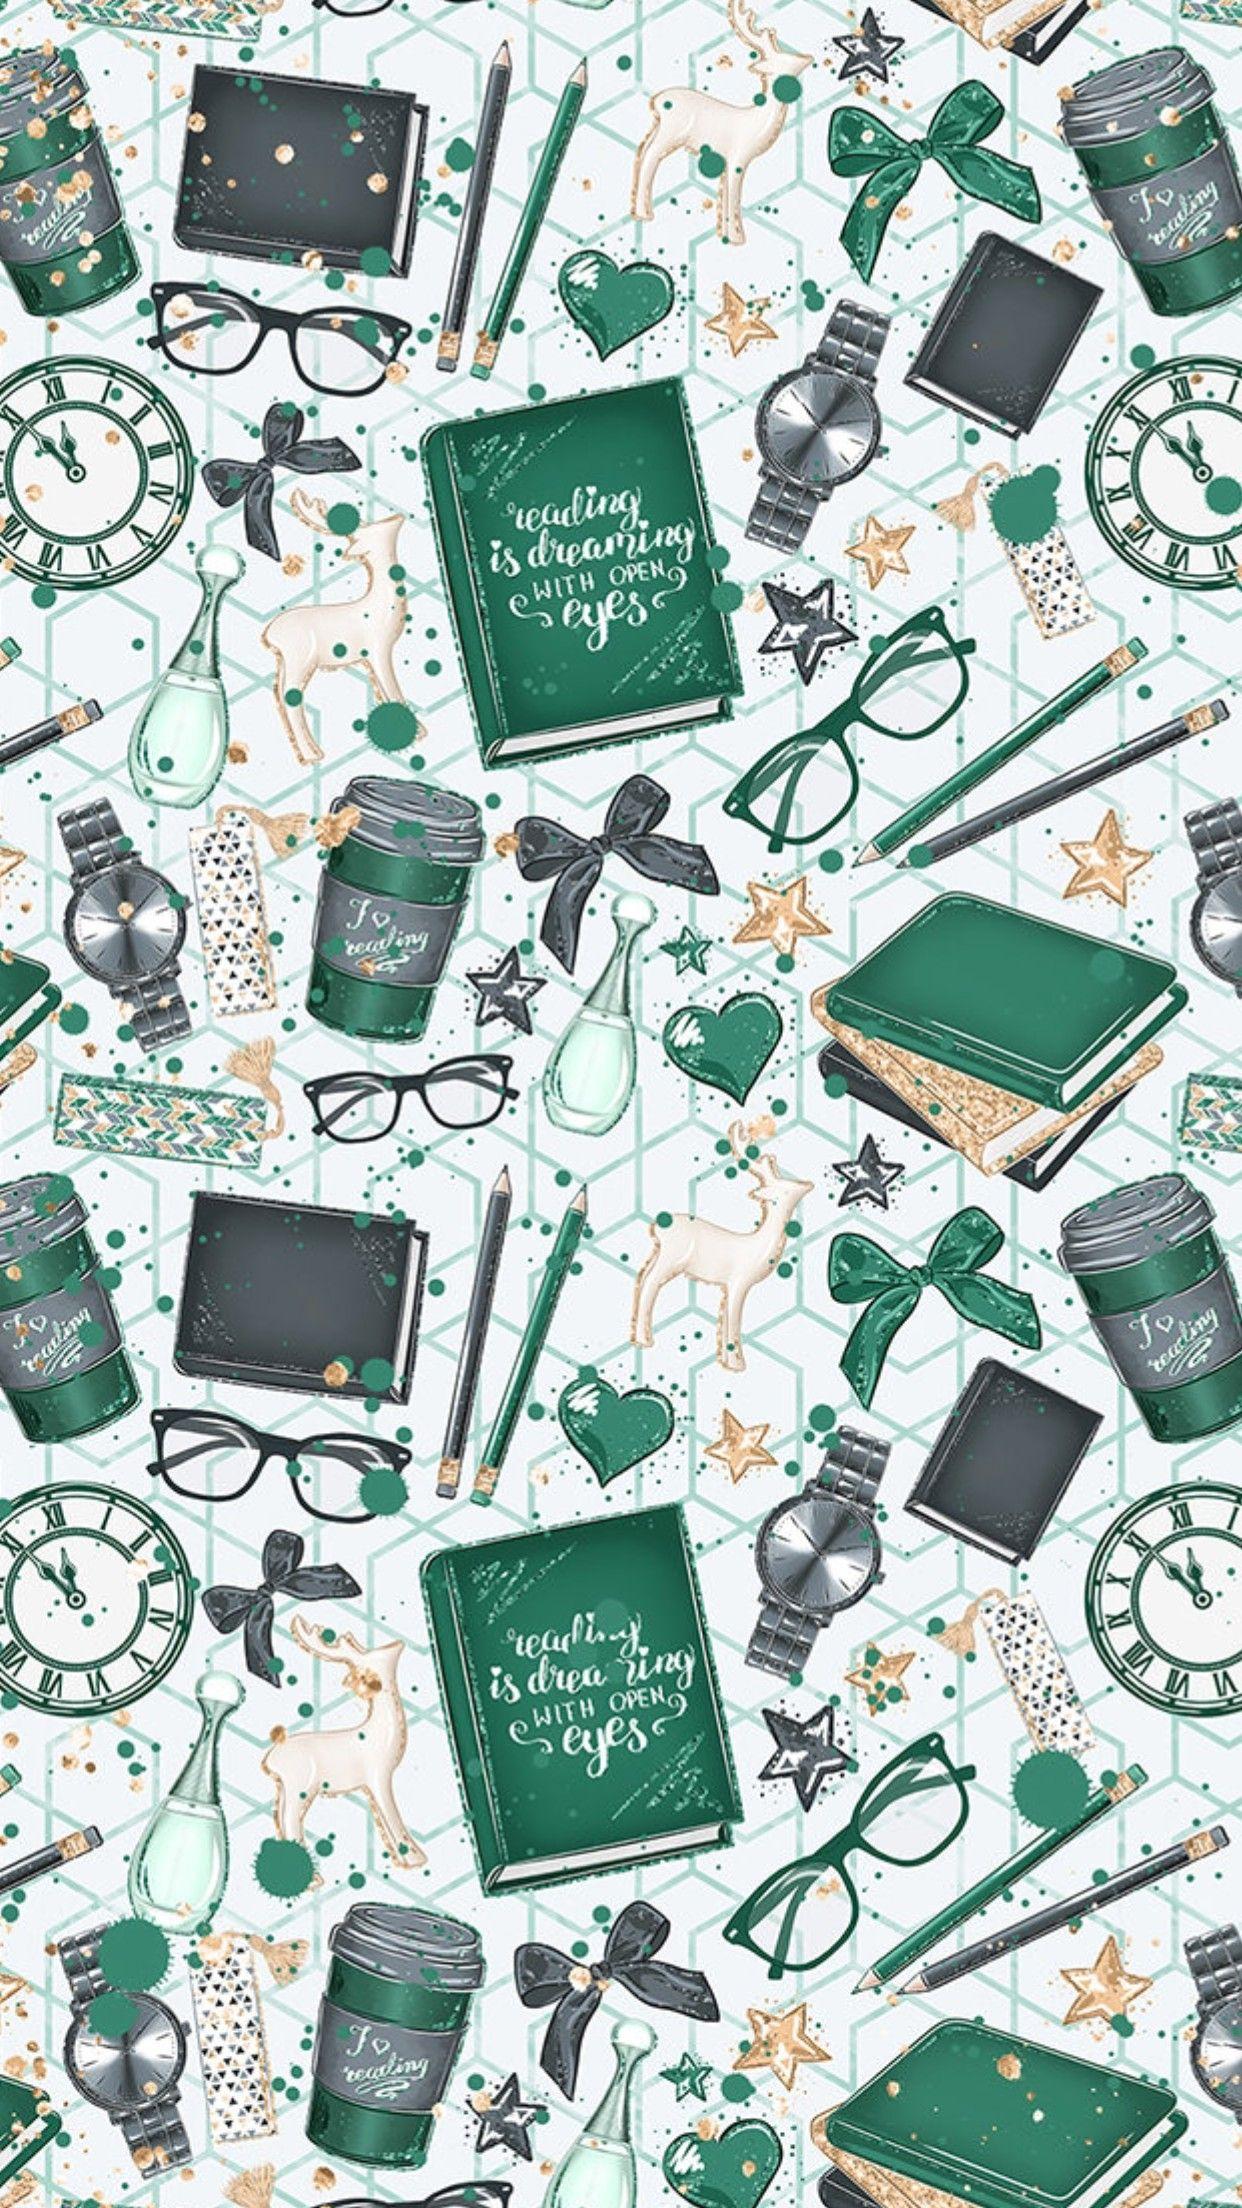 Cute Green Books Wallpaper Wallpaperwallpaperscute Wallpaper Wallpapers Cute Kertas Dinding Wallpaper Ponsel Papan Kapur